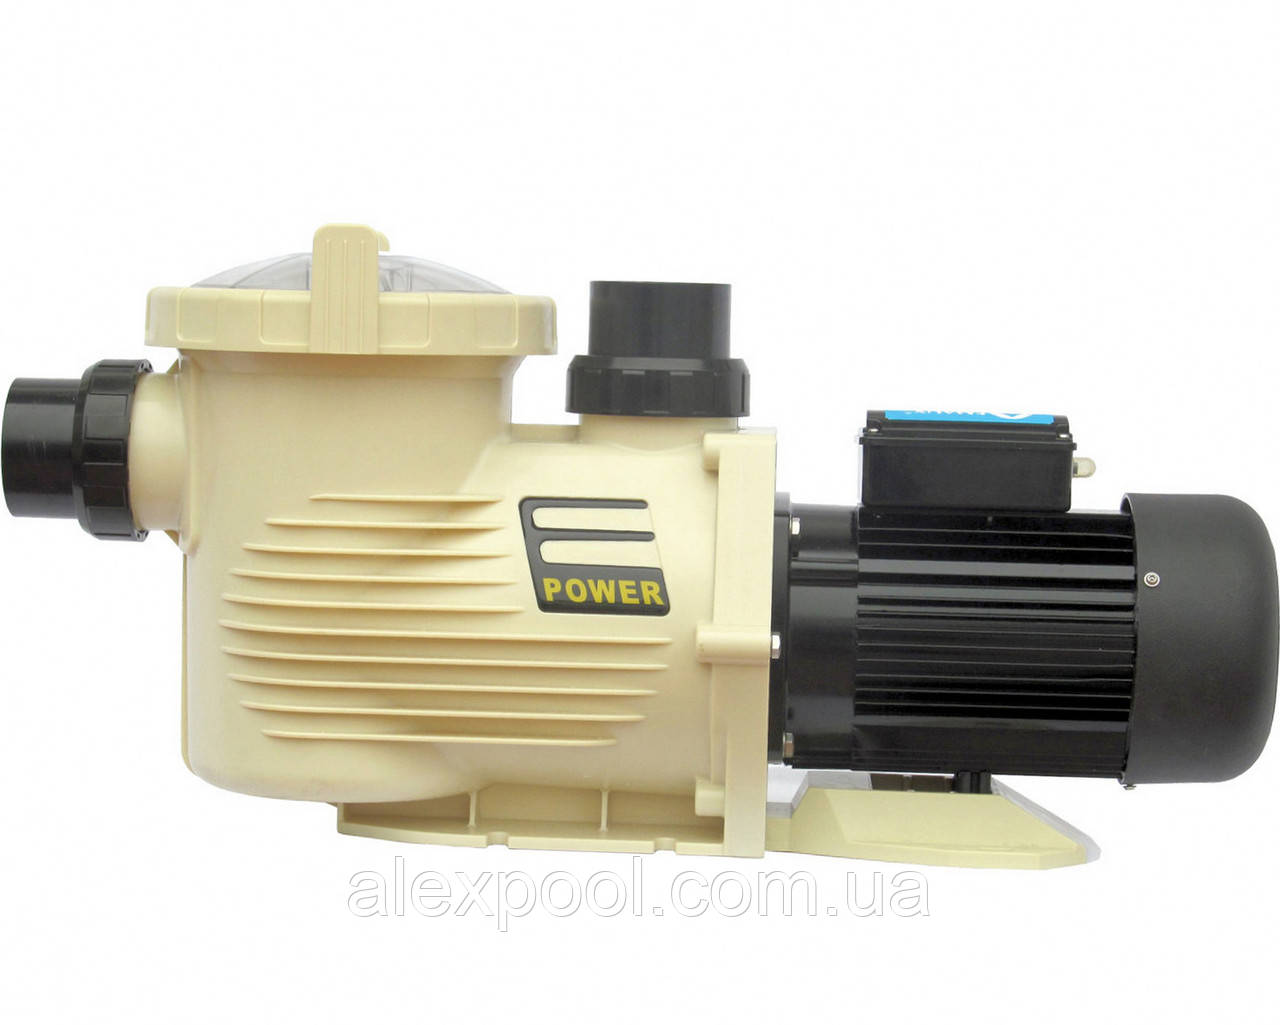 Насос для бассейна Emaux EPH400 (EPH 400, 33 м. куб/час, 2,6 кВт, 4 HP, 380В)